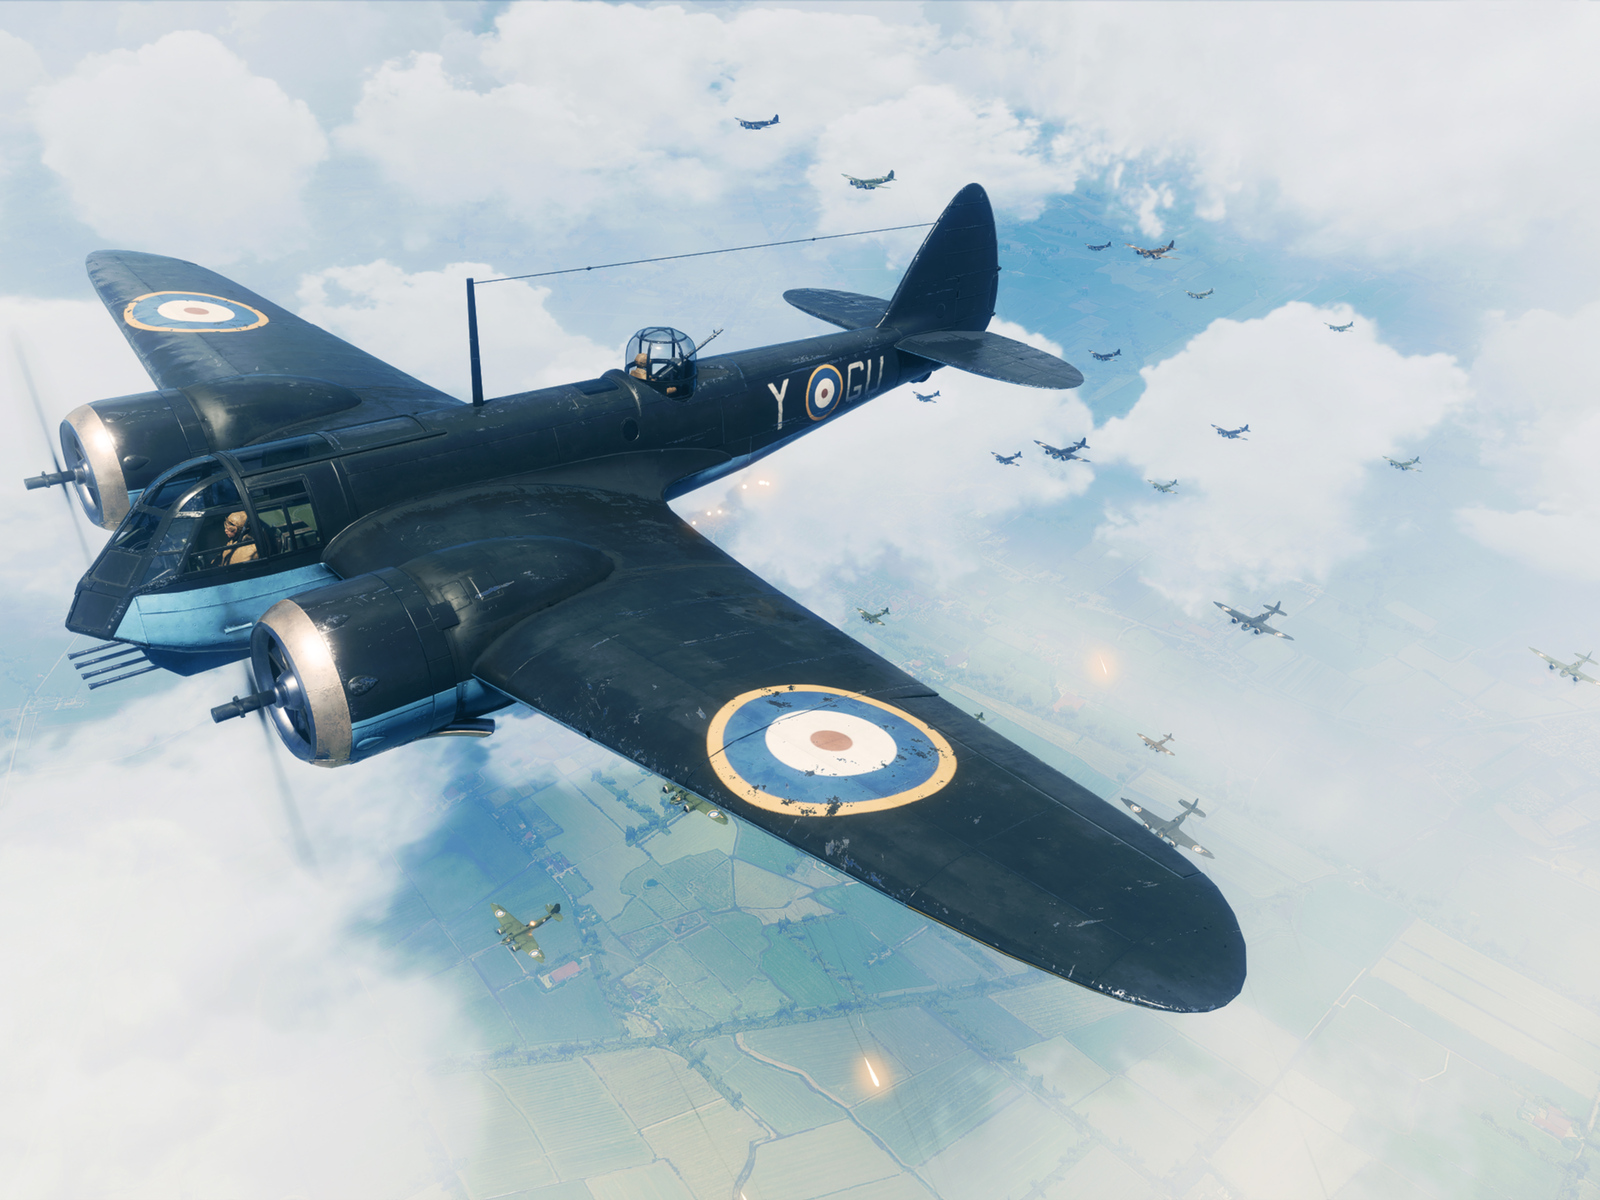 battlefield-v-plane-fight-5k-k9.jpg